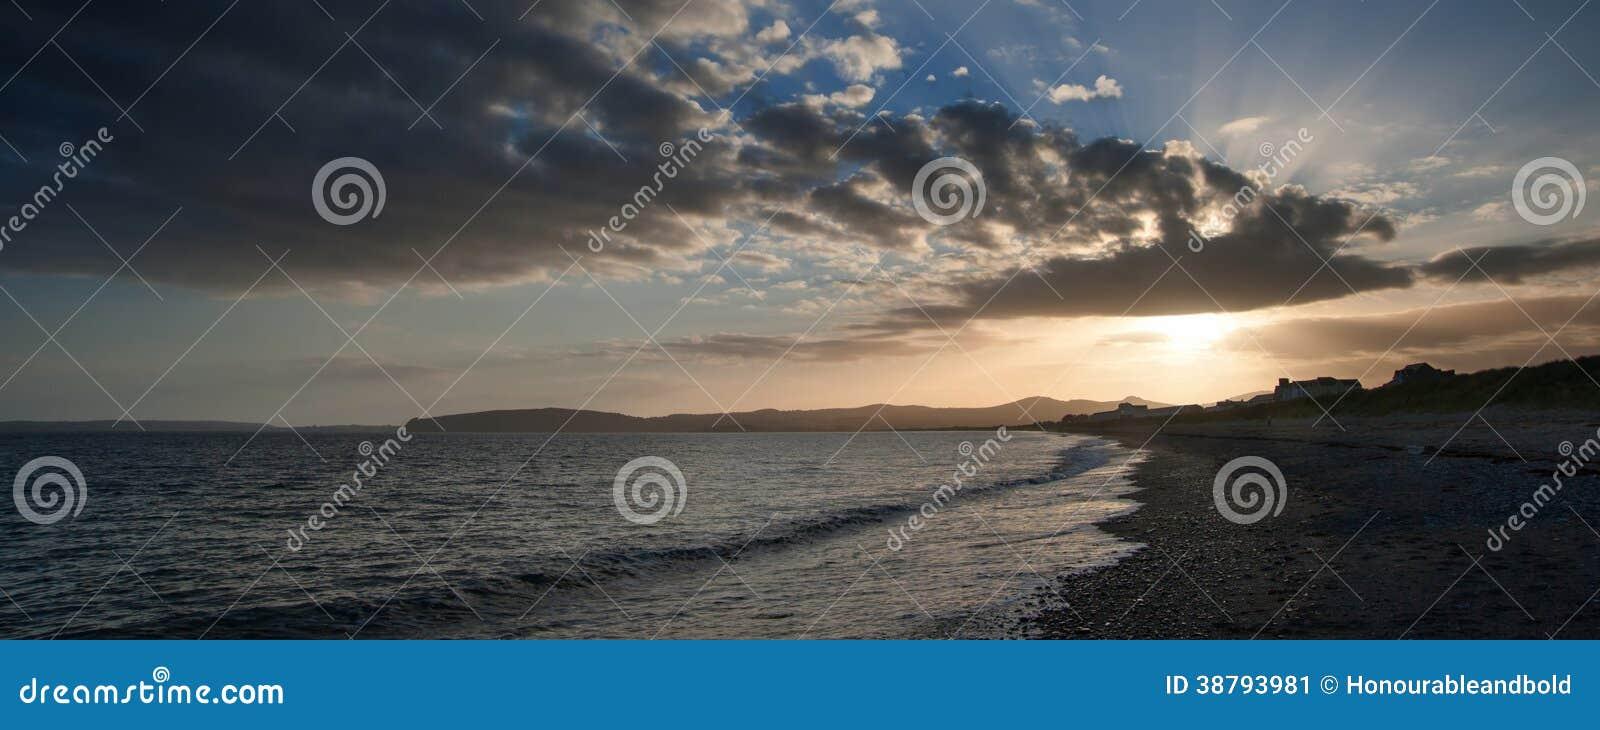 Panorama Landscape Beach Scene During Sunset Stock Image